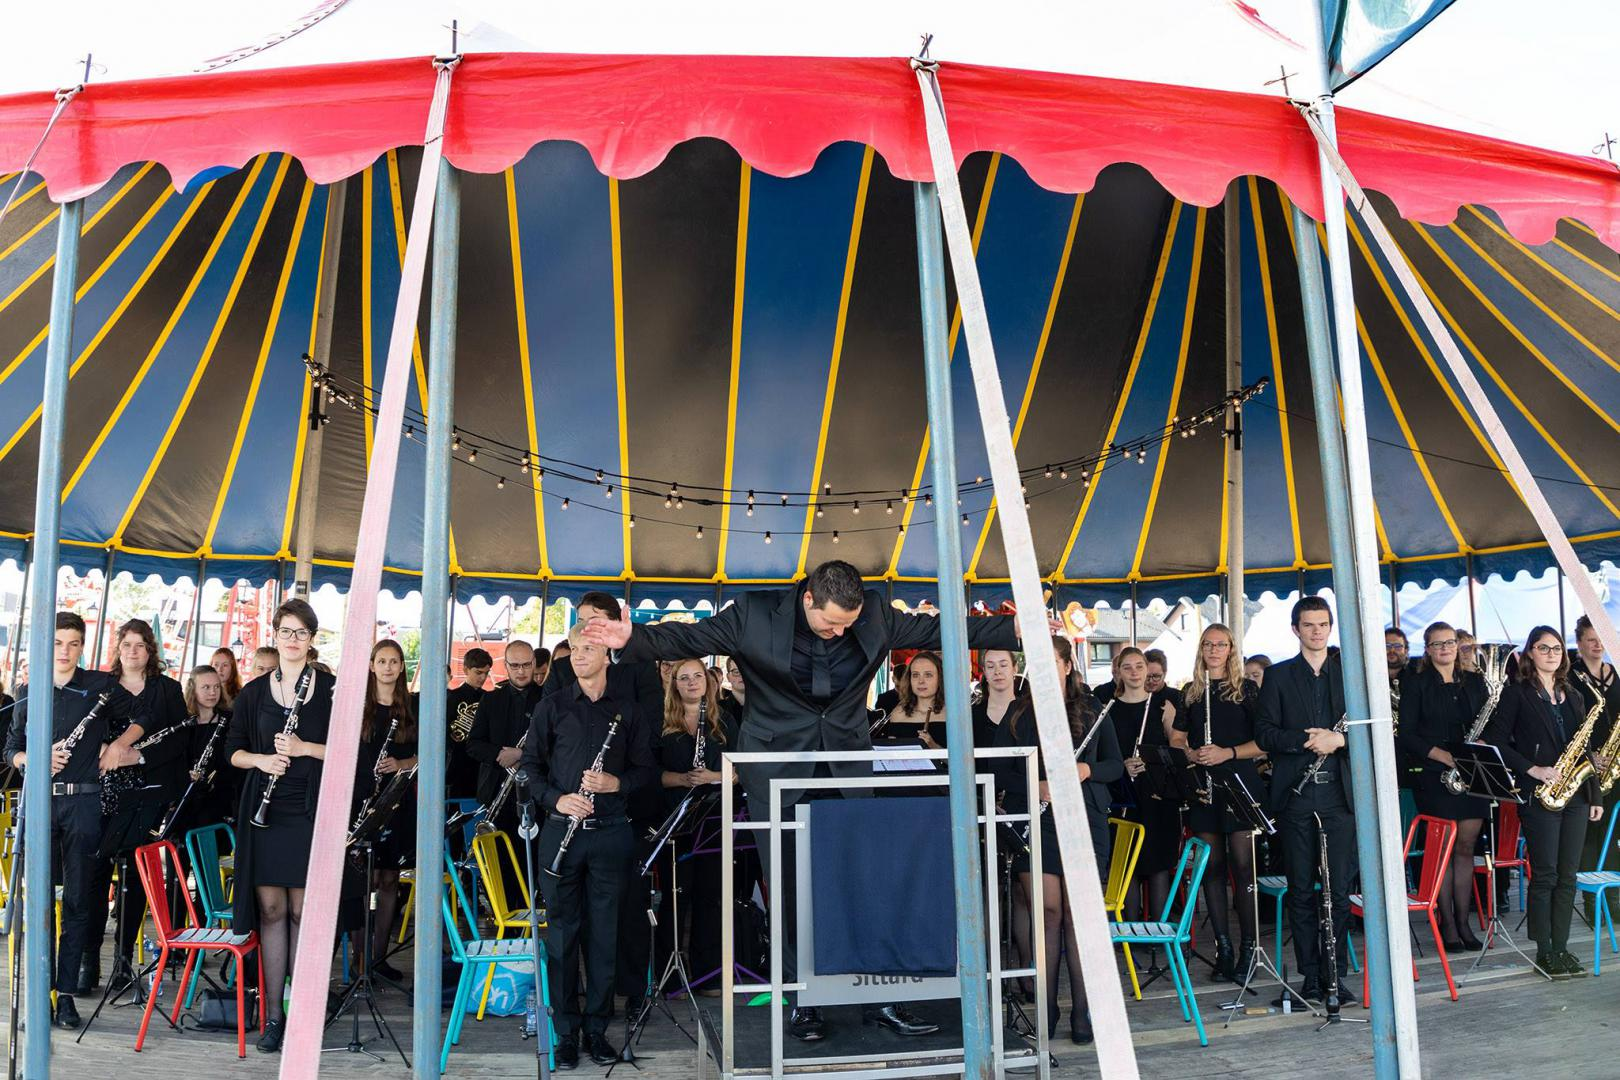 Partner: Limburgse Bond van Muziekgezelschappen (LBM)